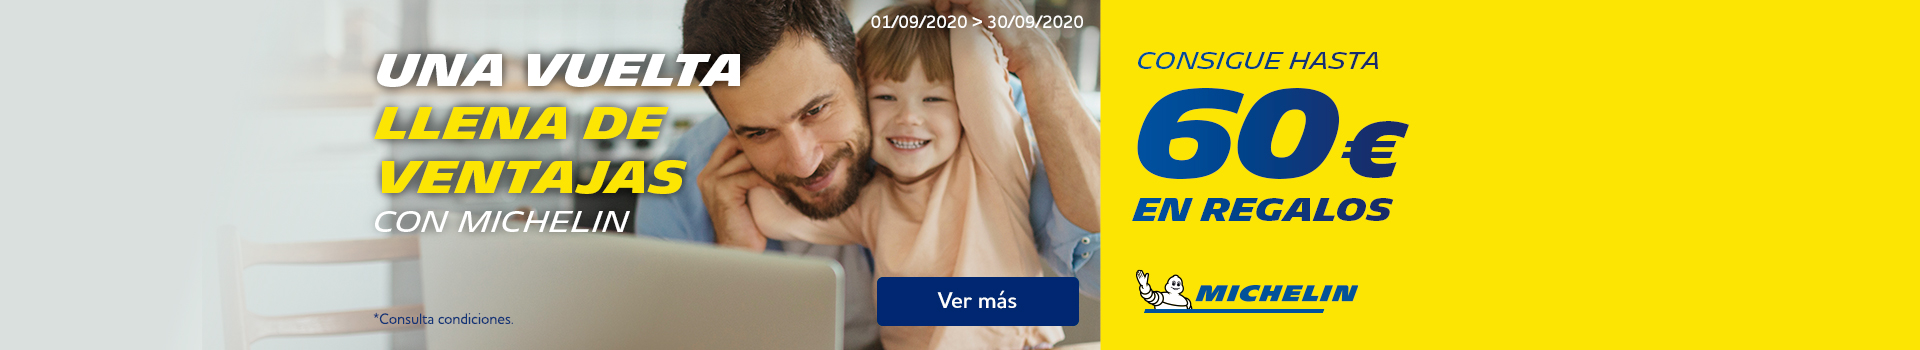 https://s1.medias-norauto.fr/banners/homepage/es/slider/1920x350-Desktop-home-slider-Michelin_sept.jpg